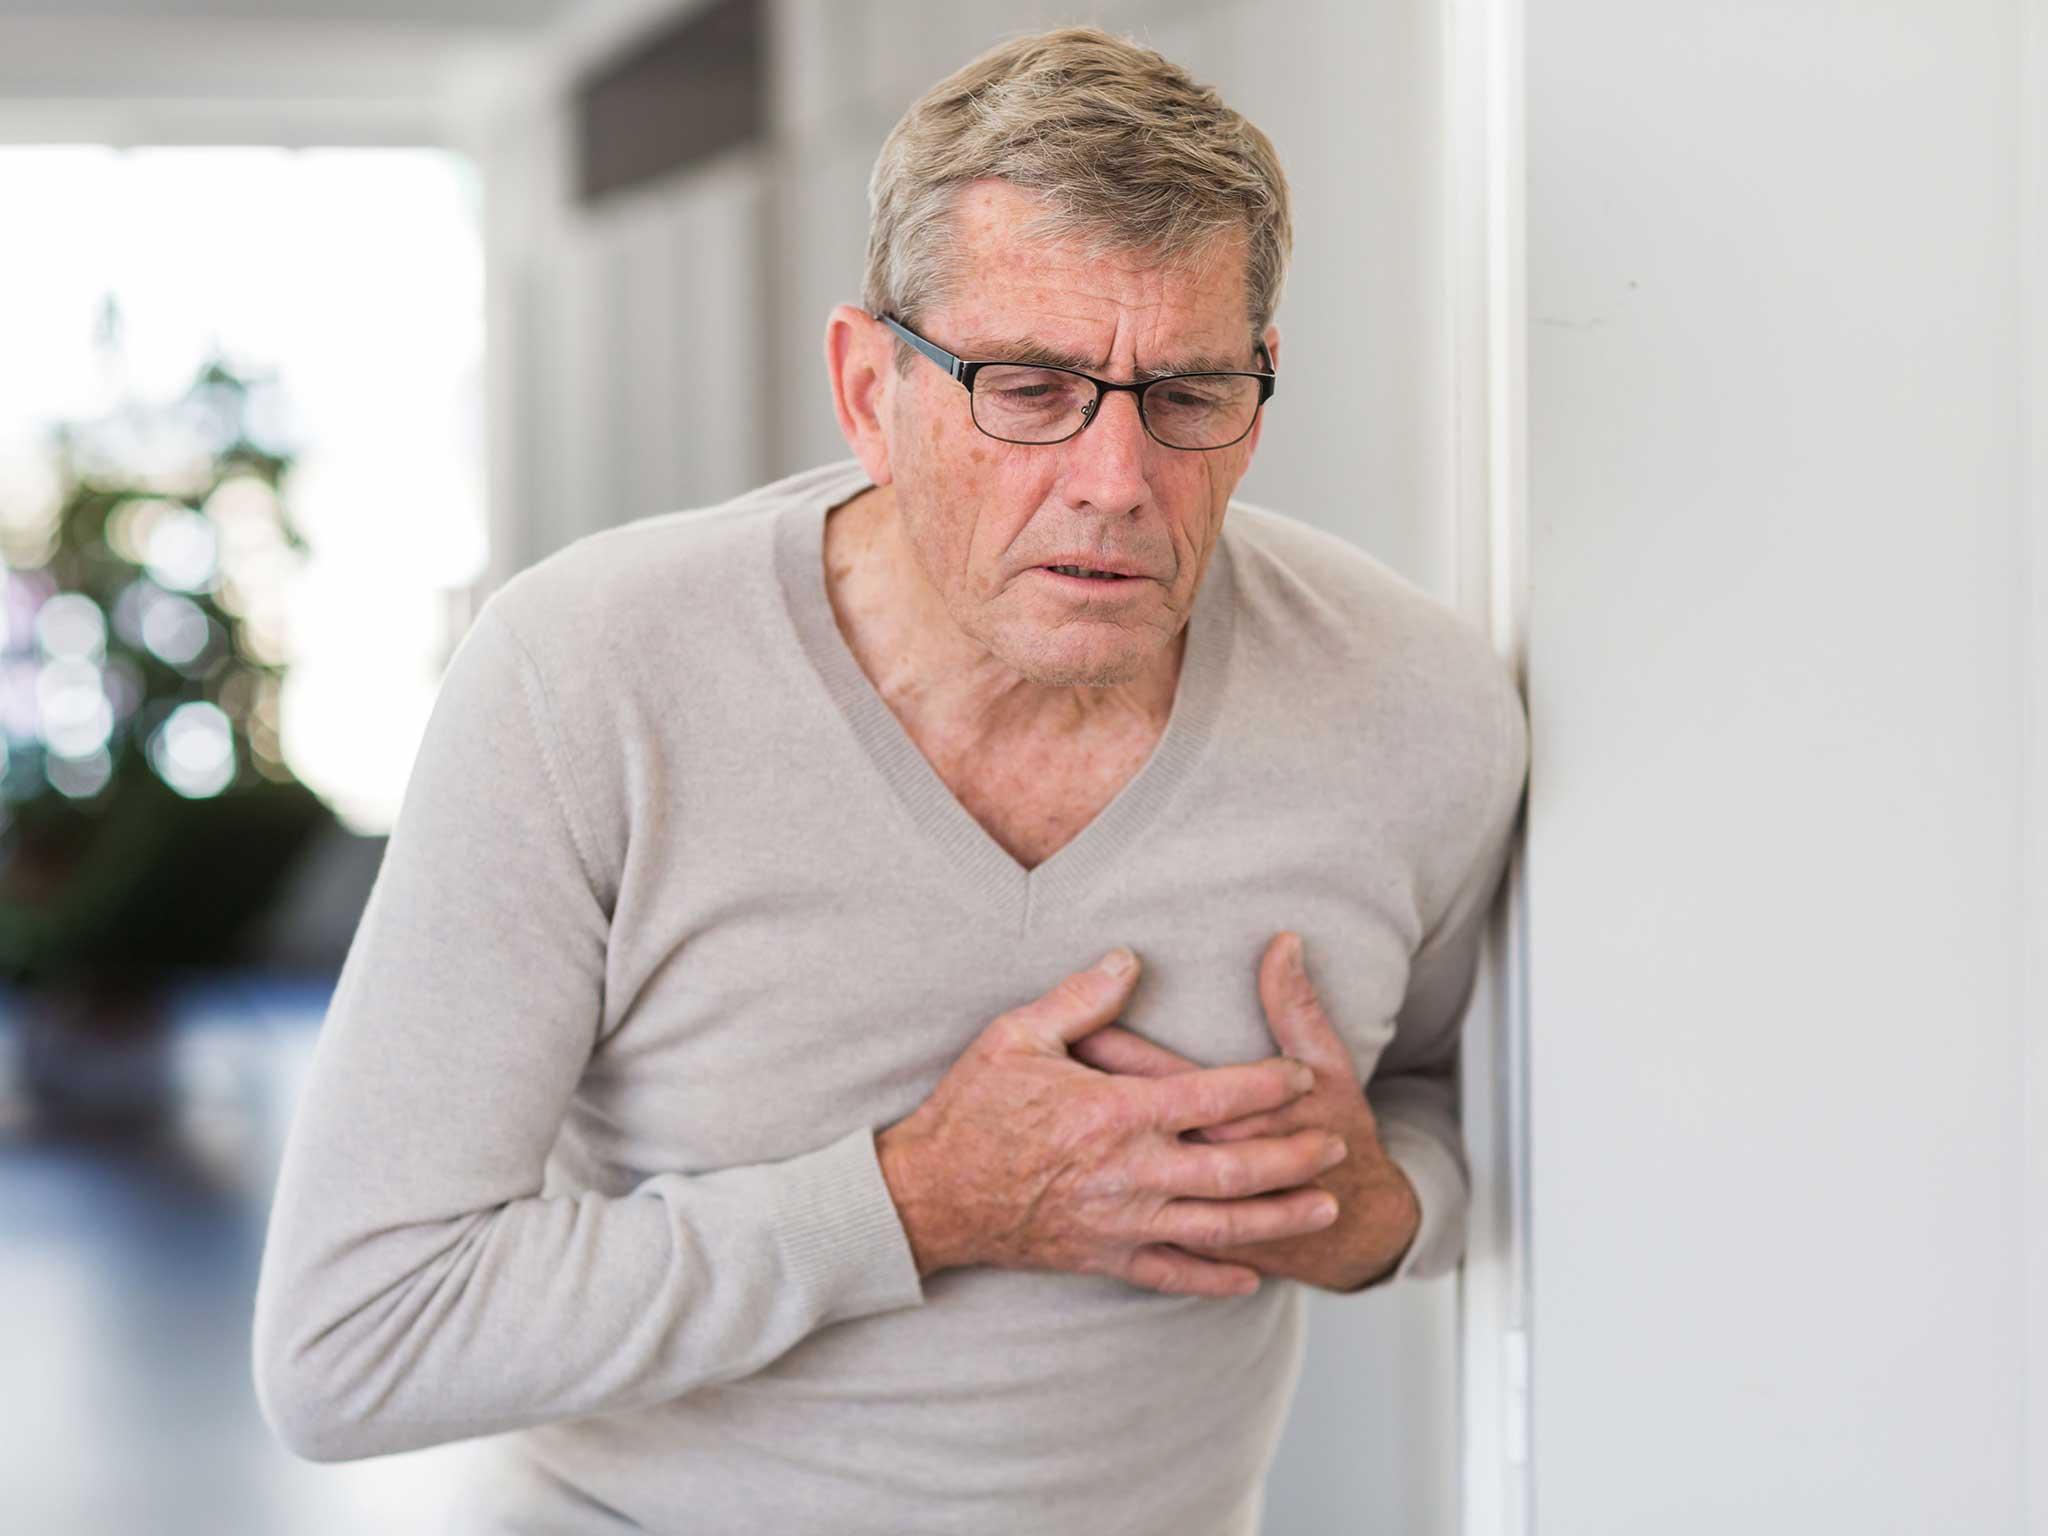 senales de un proximo infarto